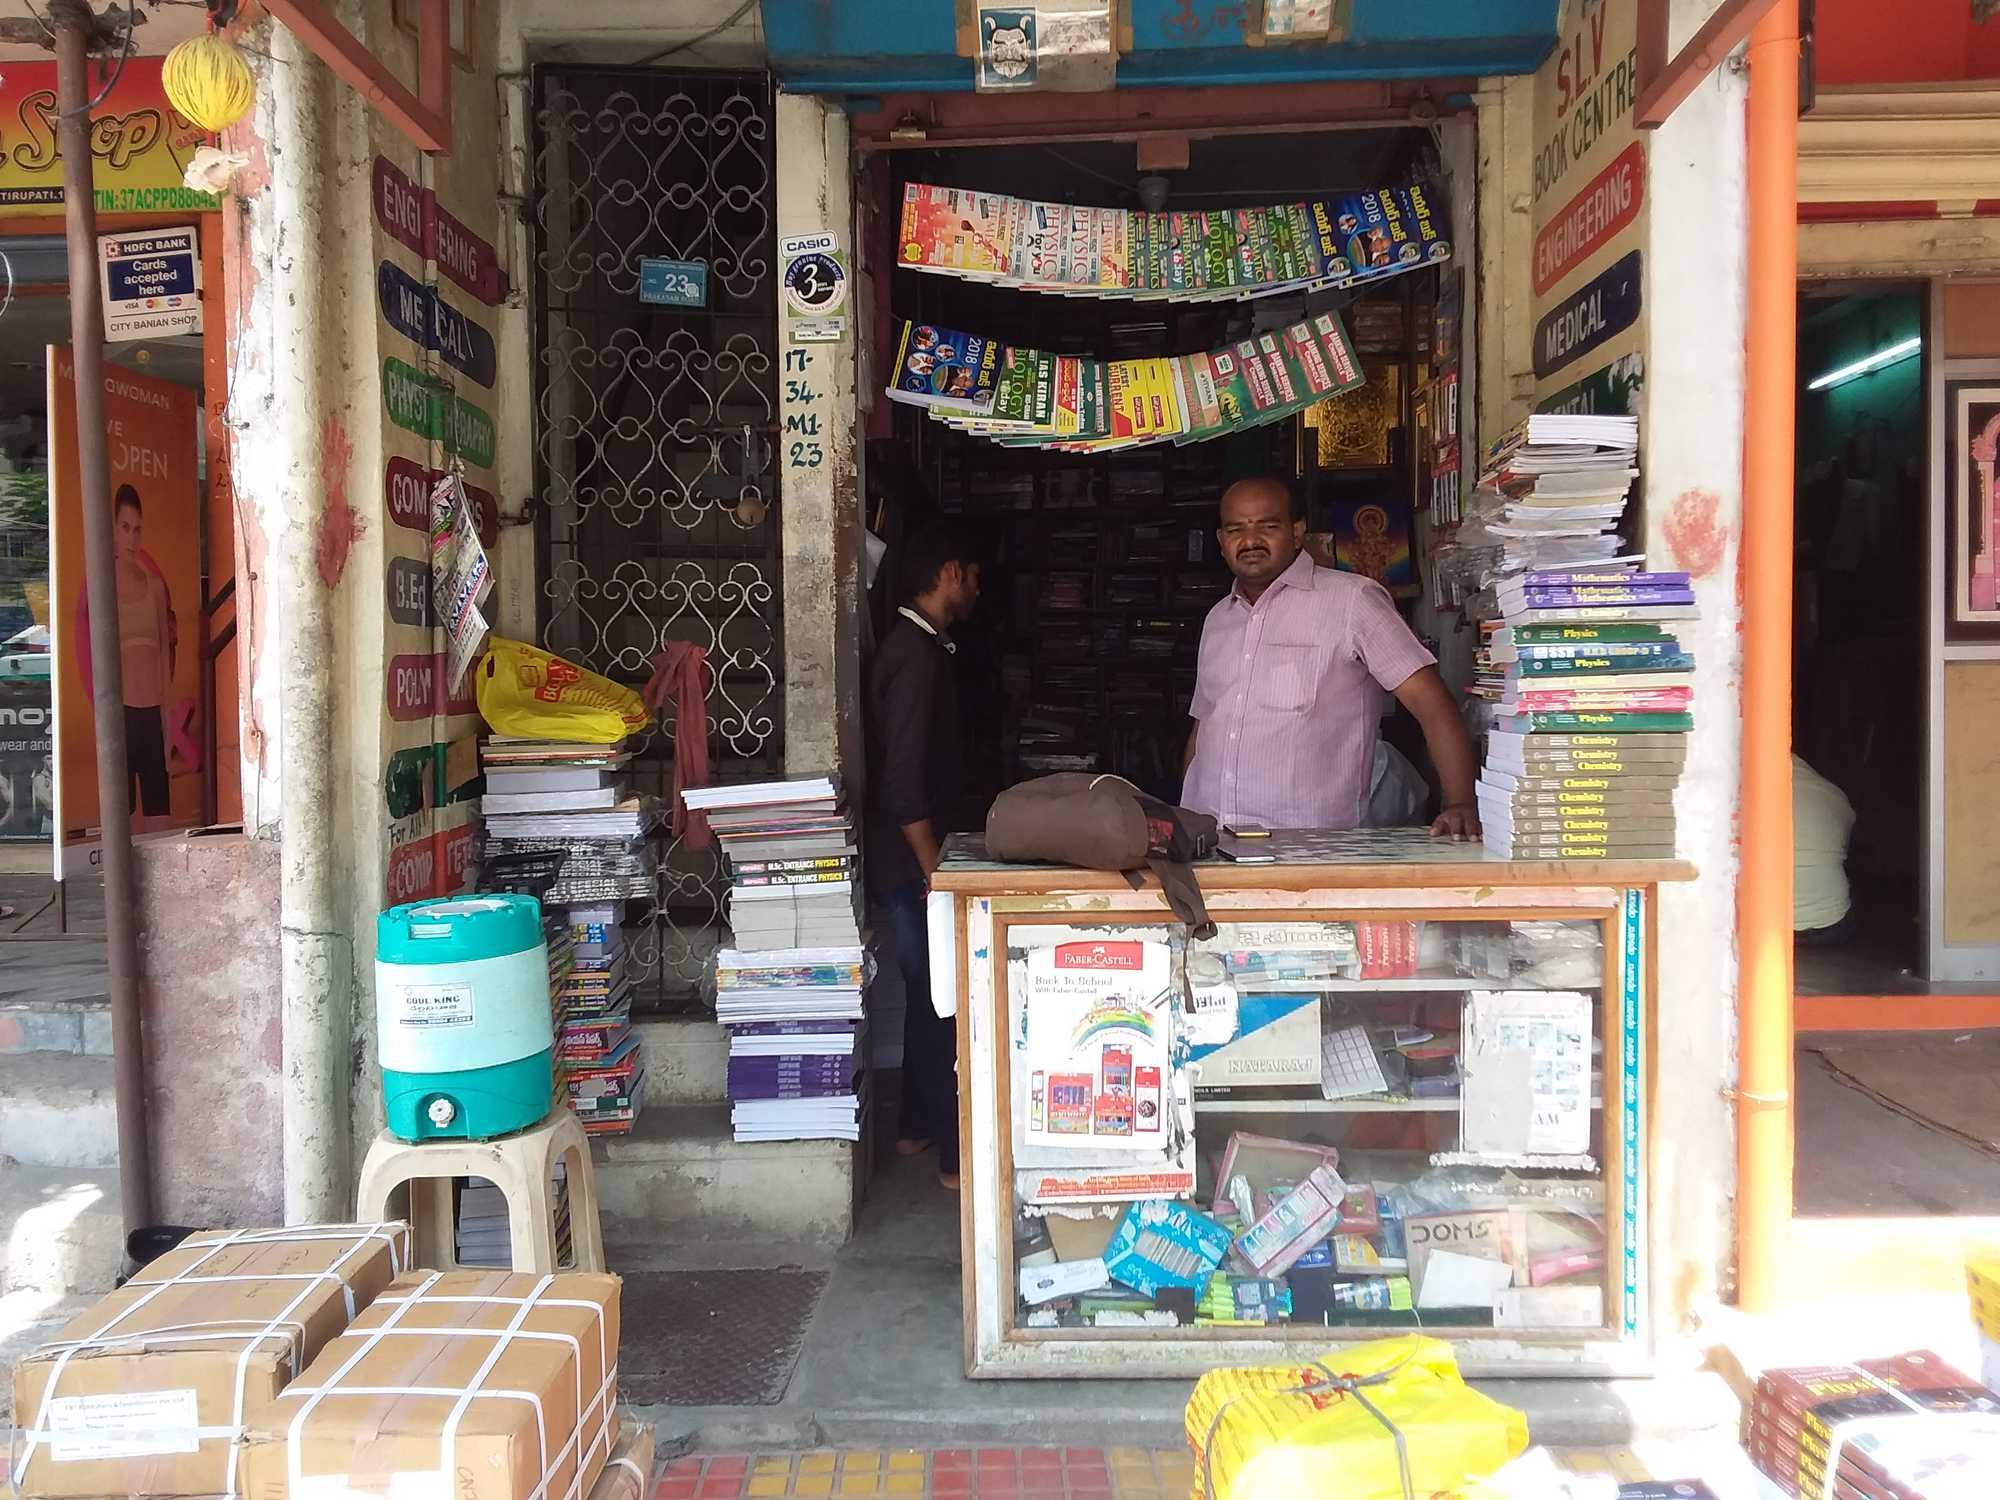 Top 10 Second Hand Book Shops in Tirupati - Best Used Book Shops